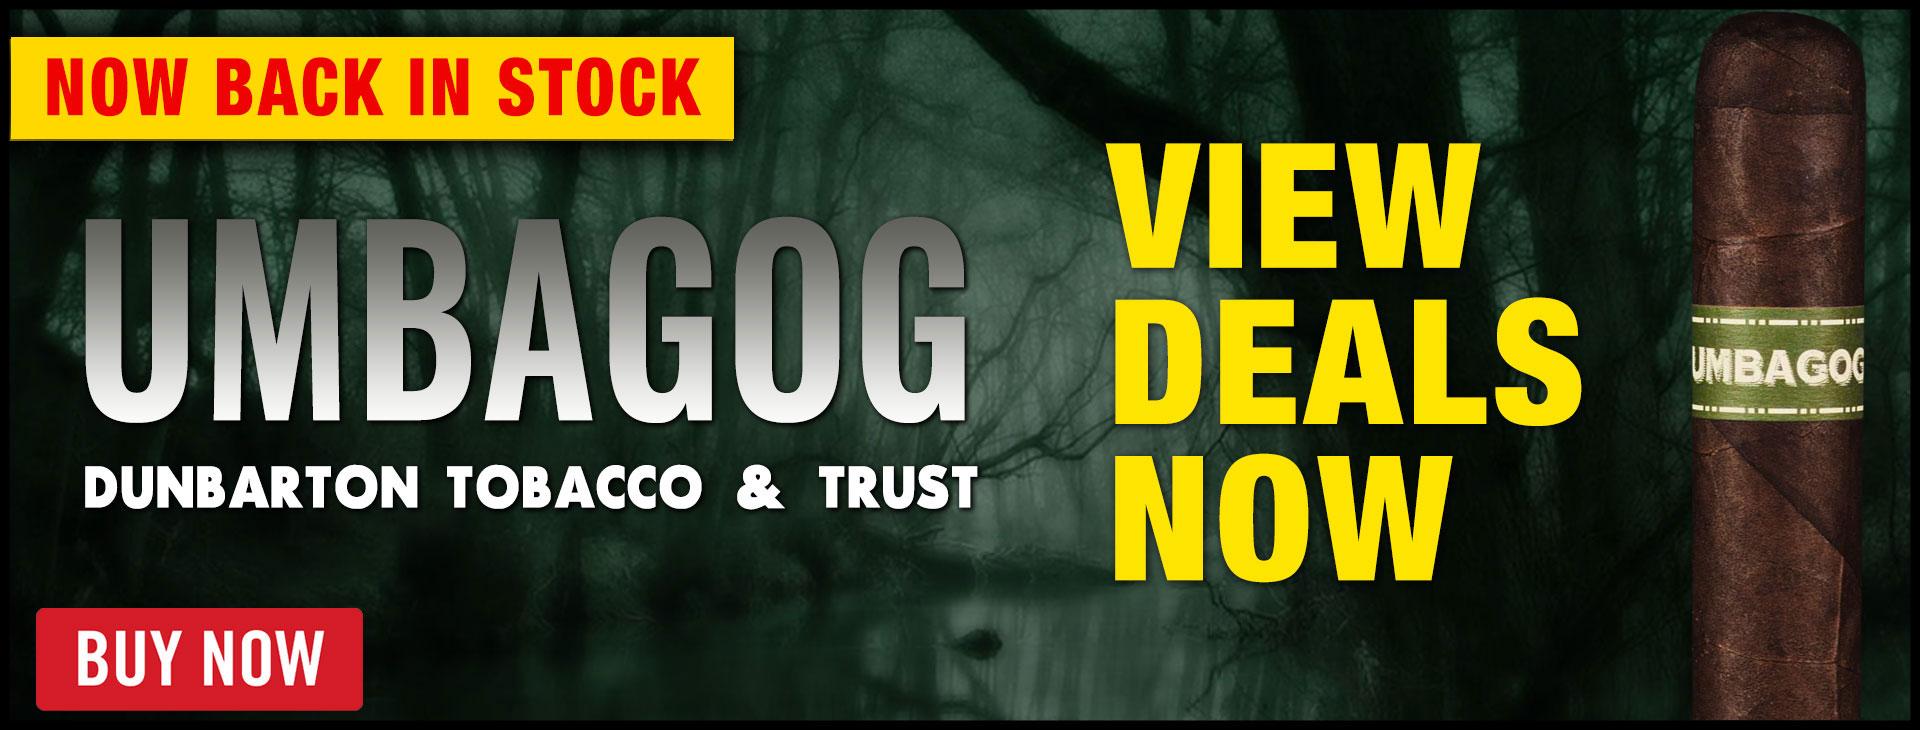 umbagog-back-in-stock-2020-banner.jpg